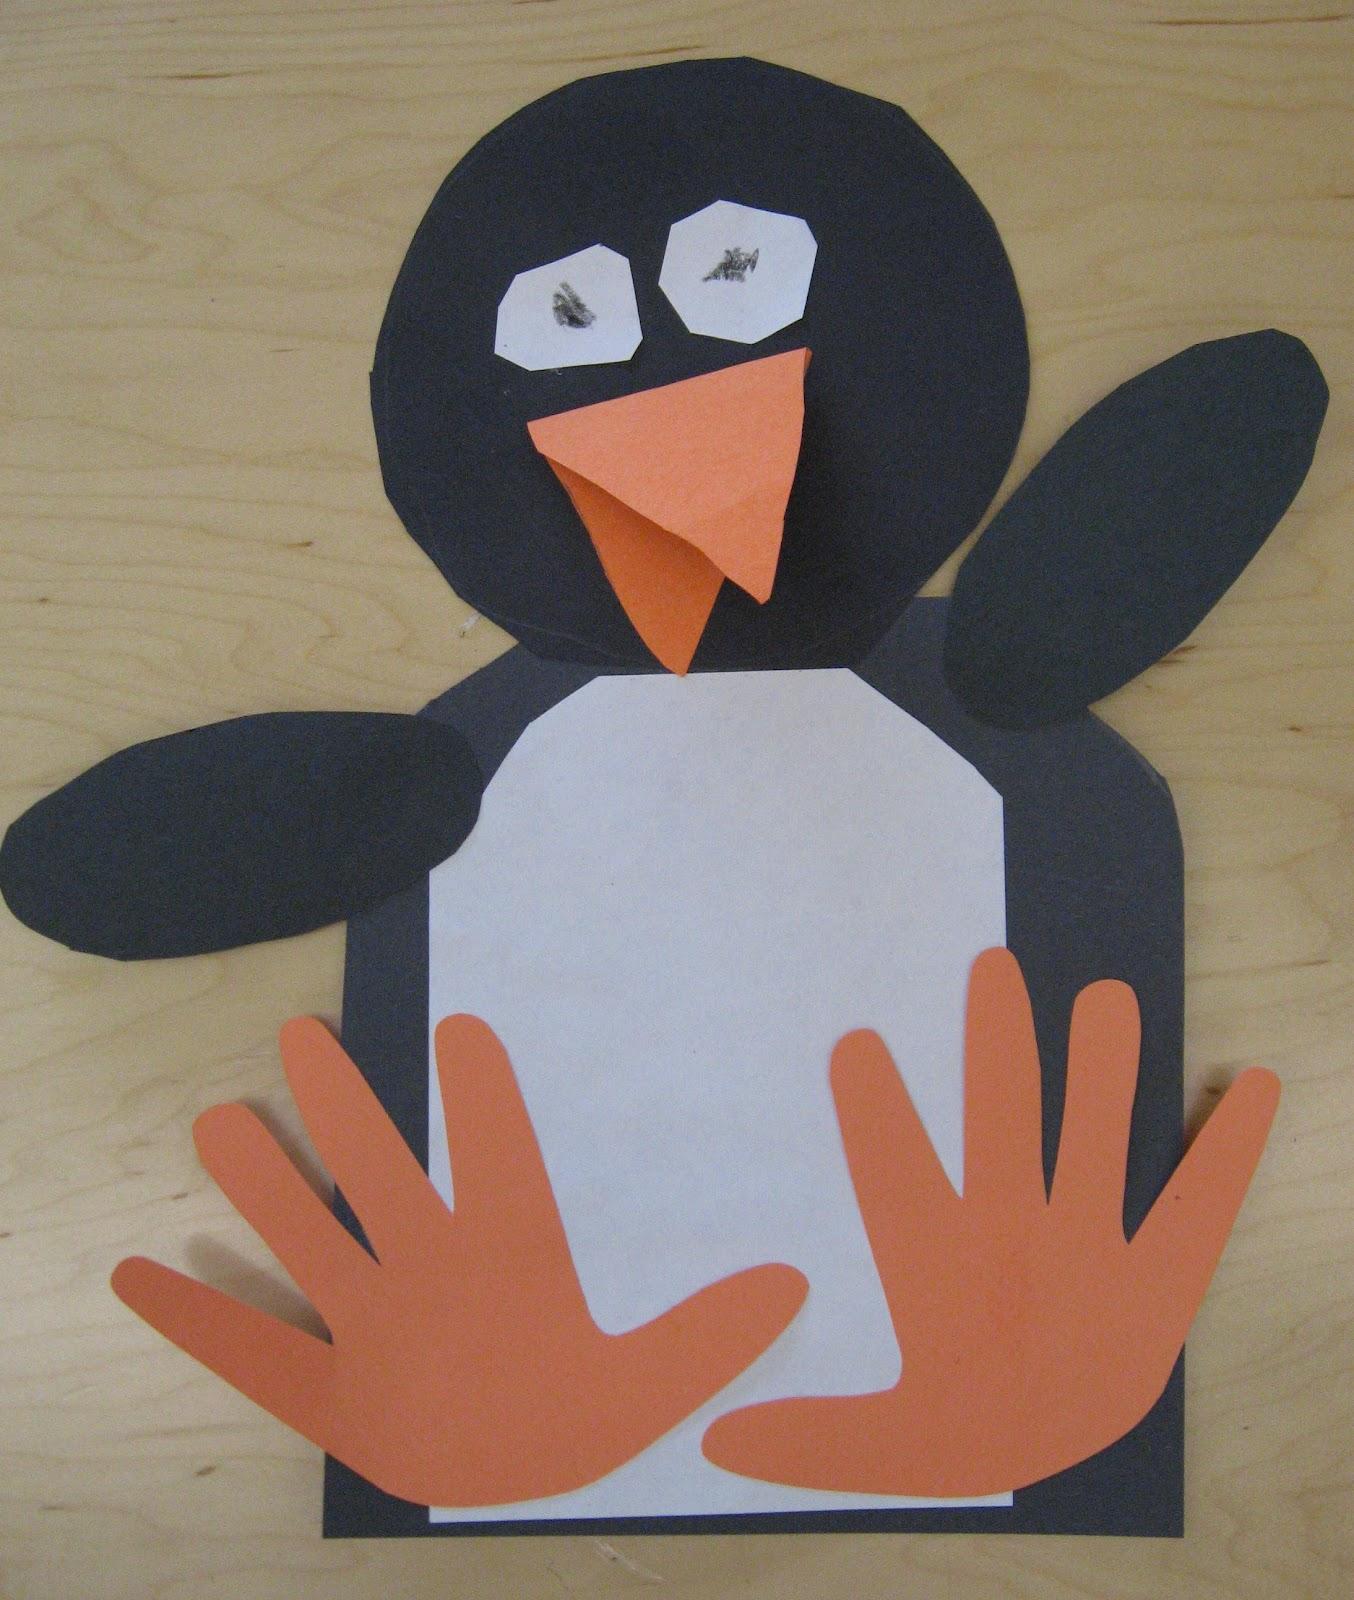 handprint penguins rubber boots and elf shoes. Black Bedroom Furniture Sets. Home Design Ideas